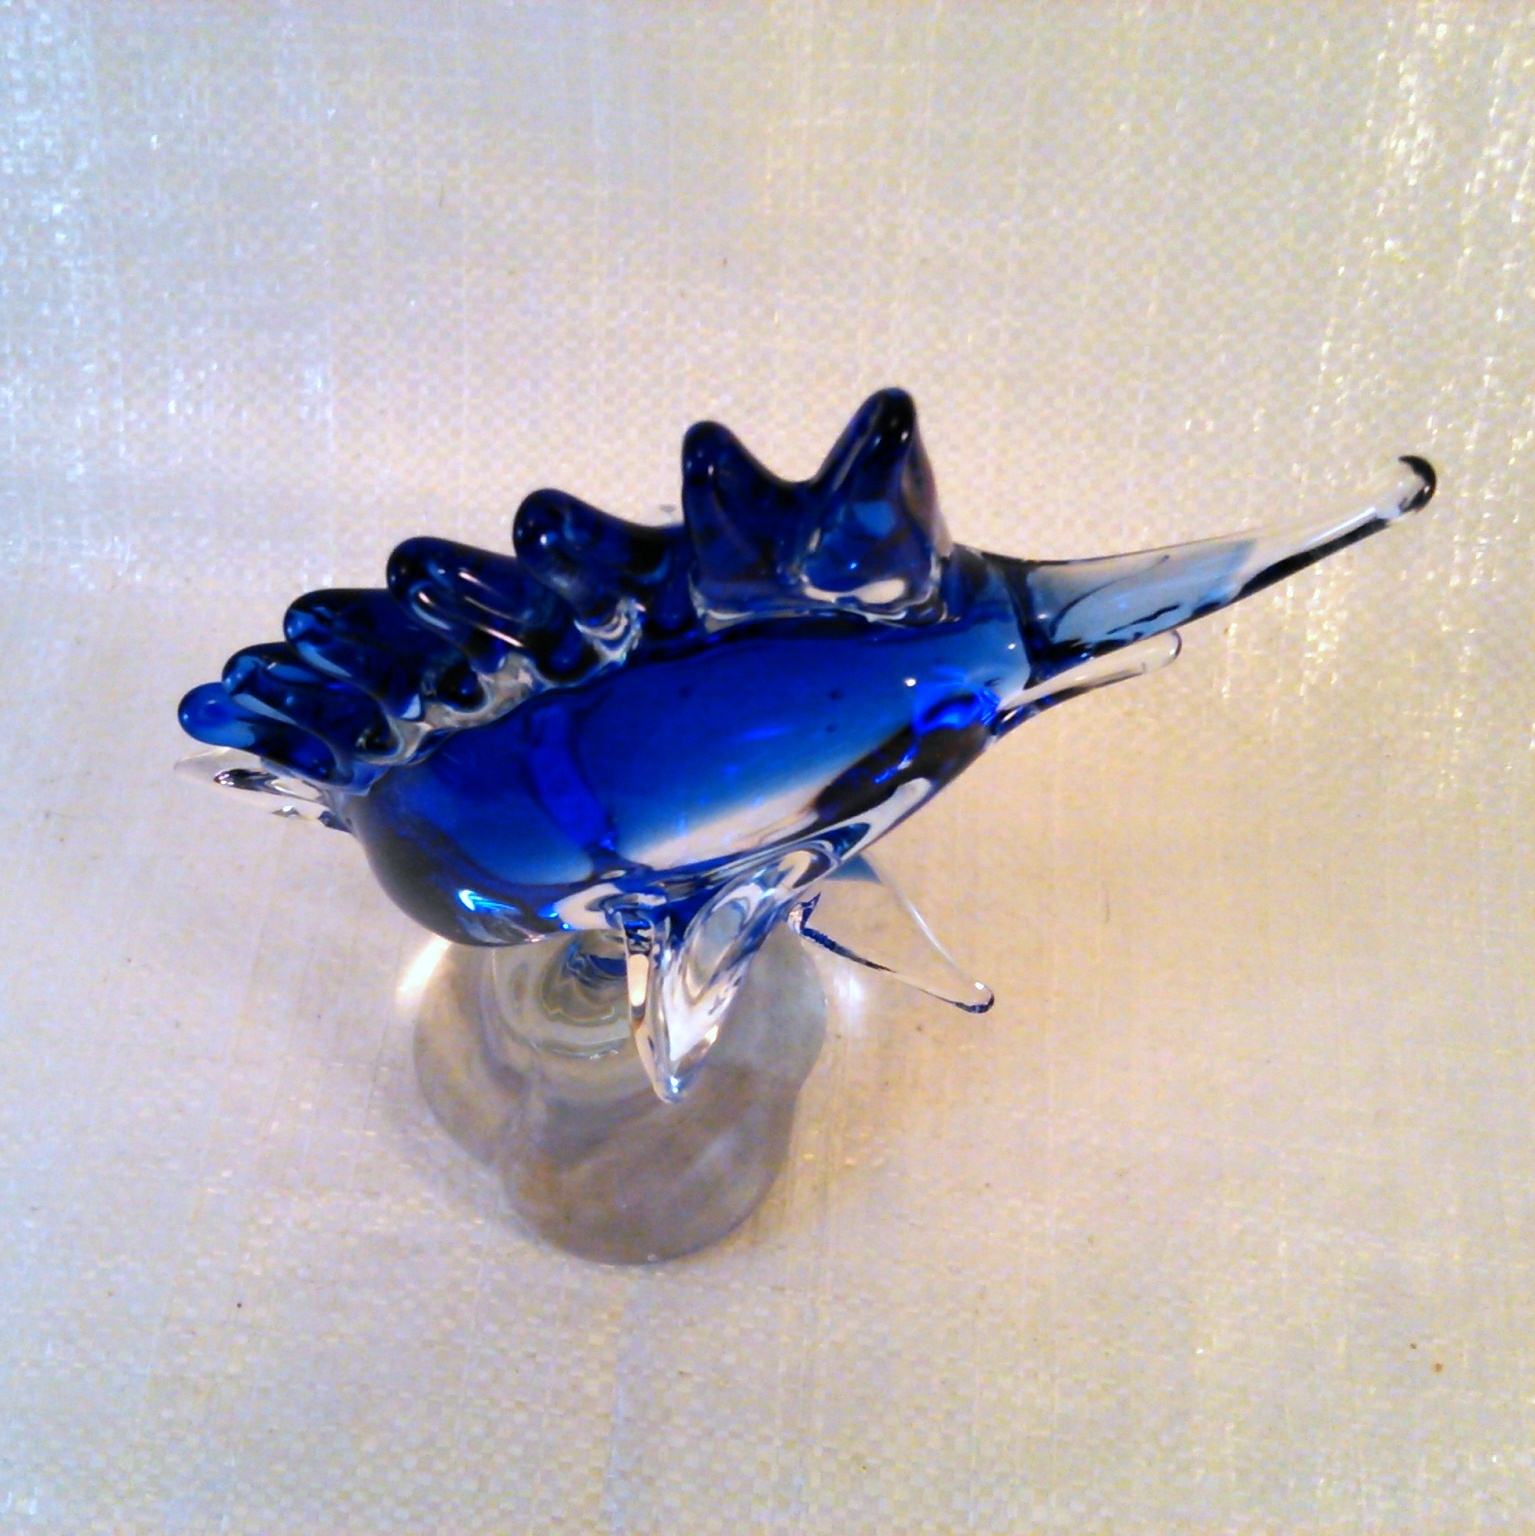 Fifth Avenue Crystal Hand Blown Glass - BLUE MARLIN SWORDFISH Figurine